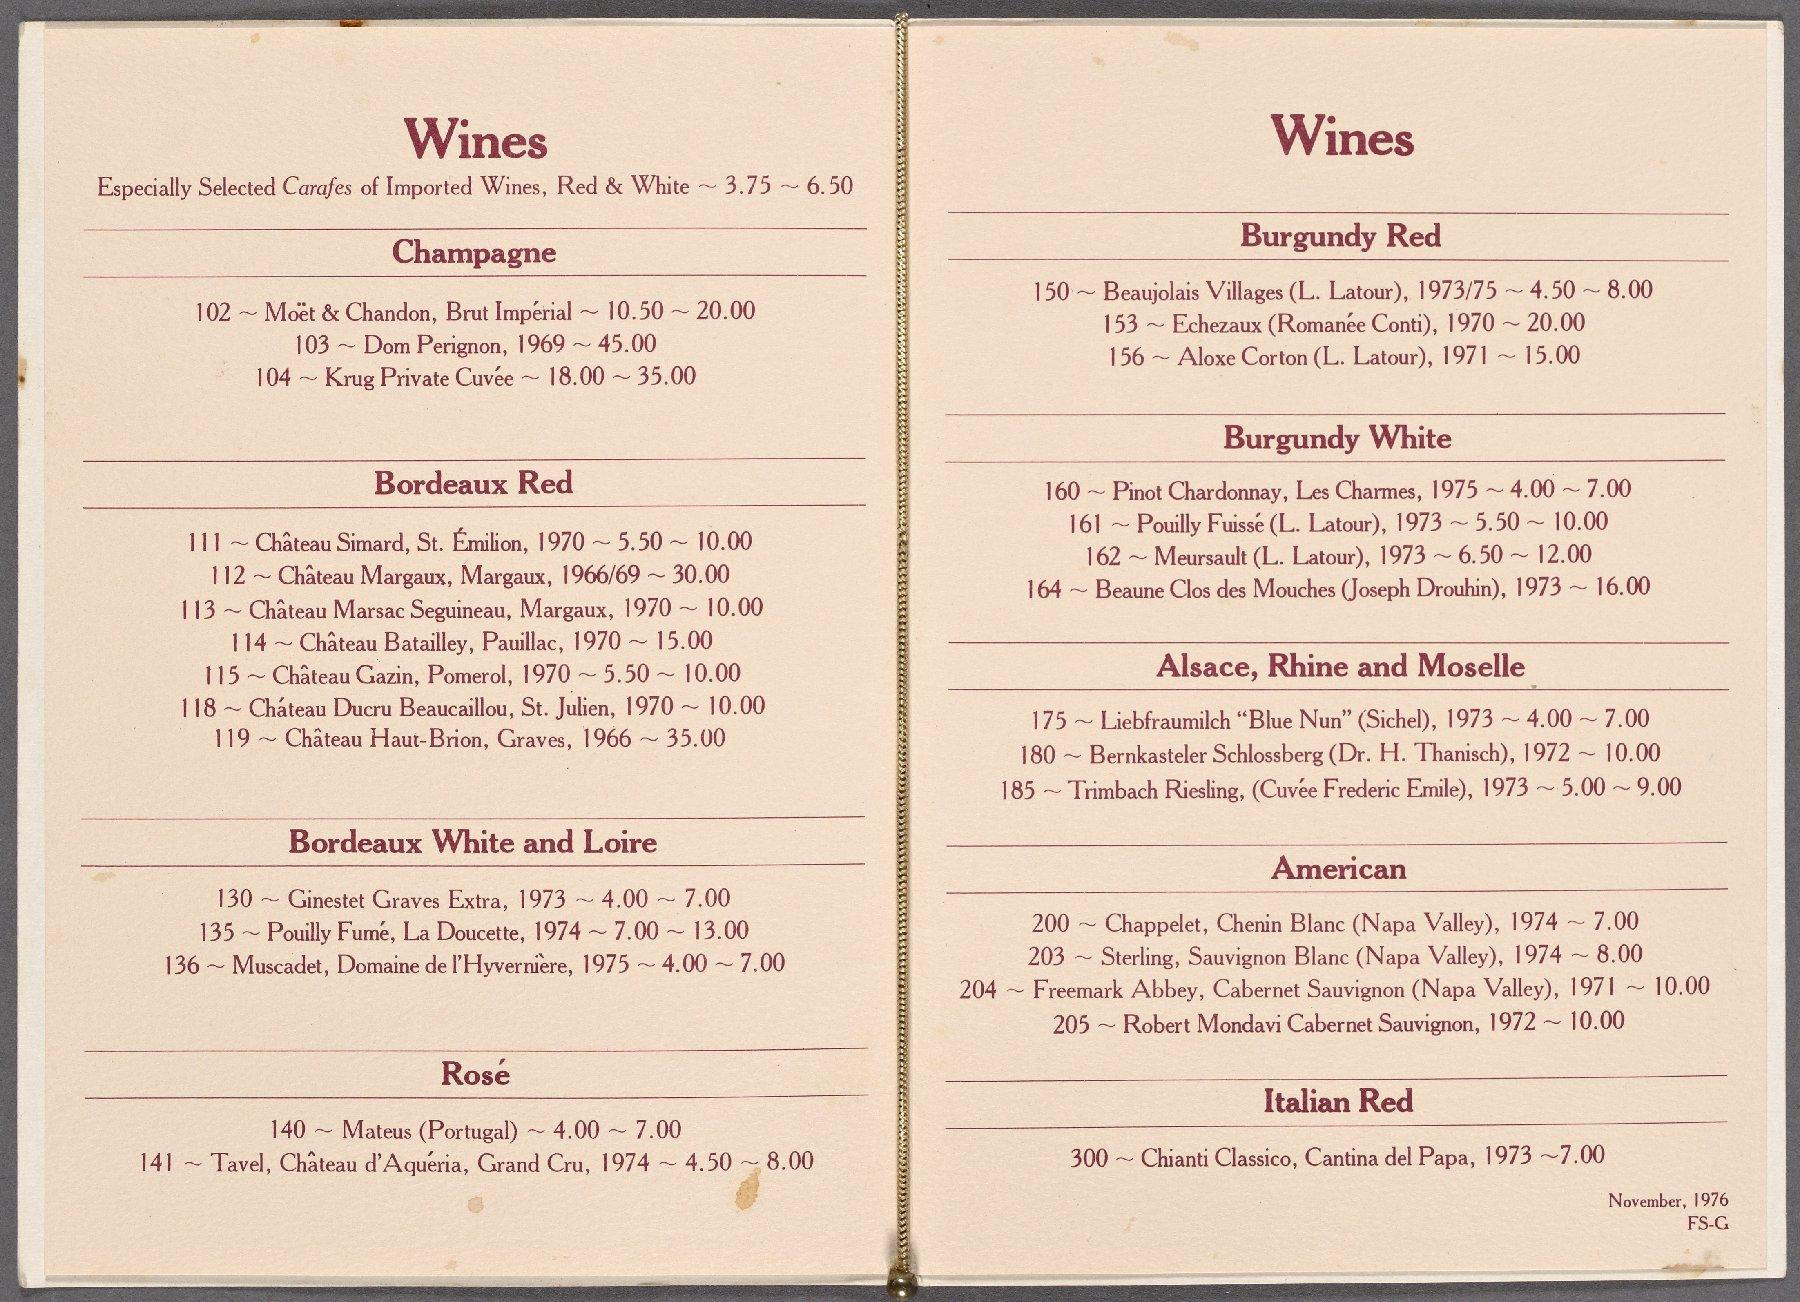 paring Nine Vintage Restaurant Menus to Their Counterparts